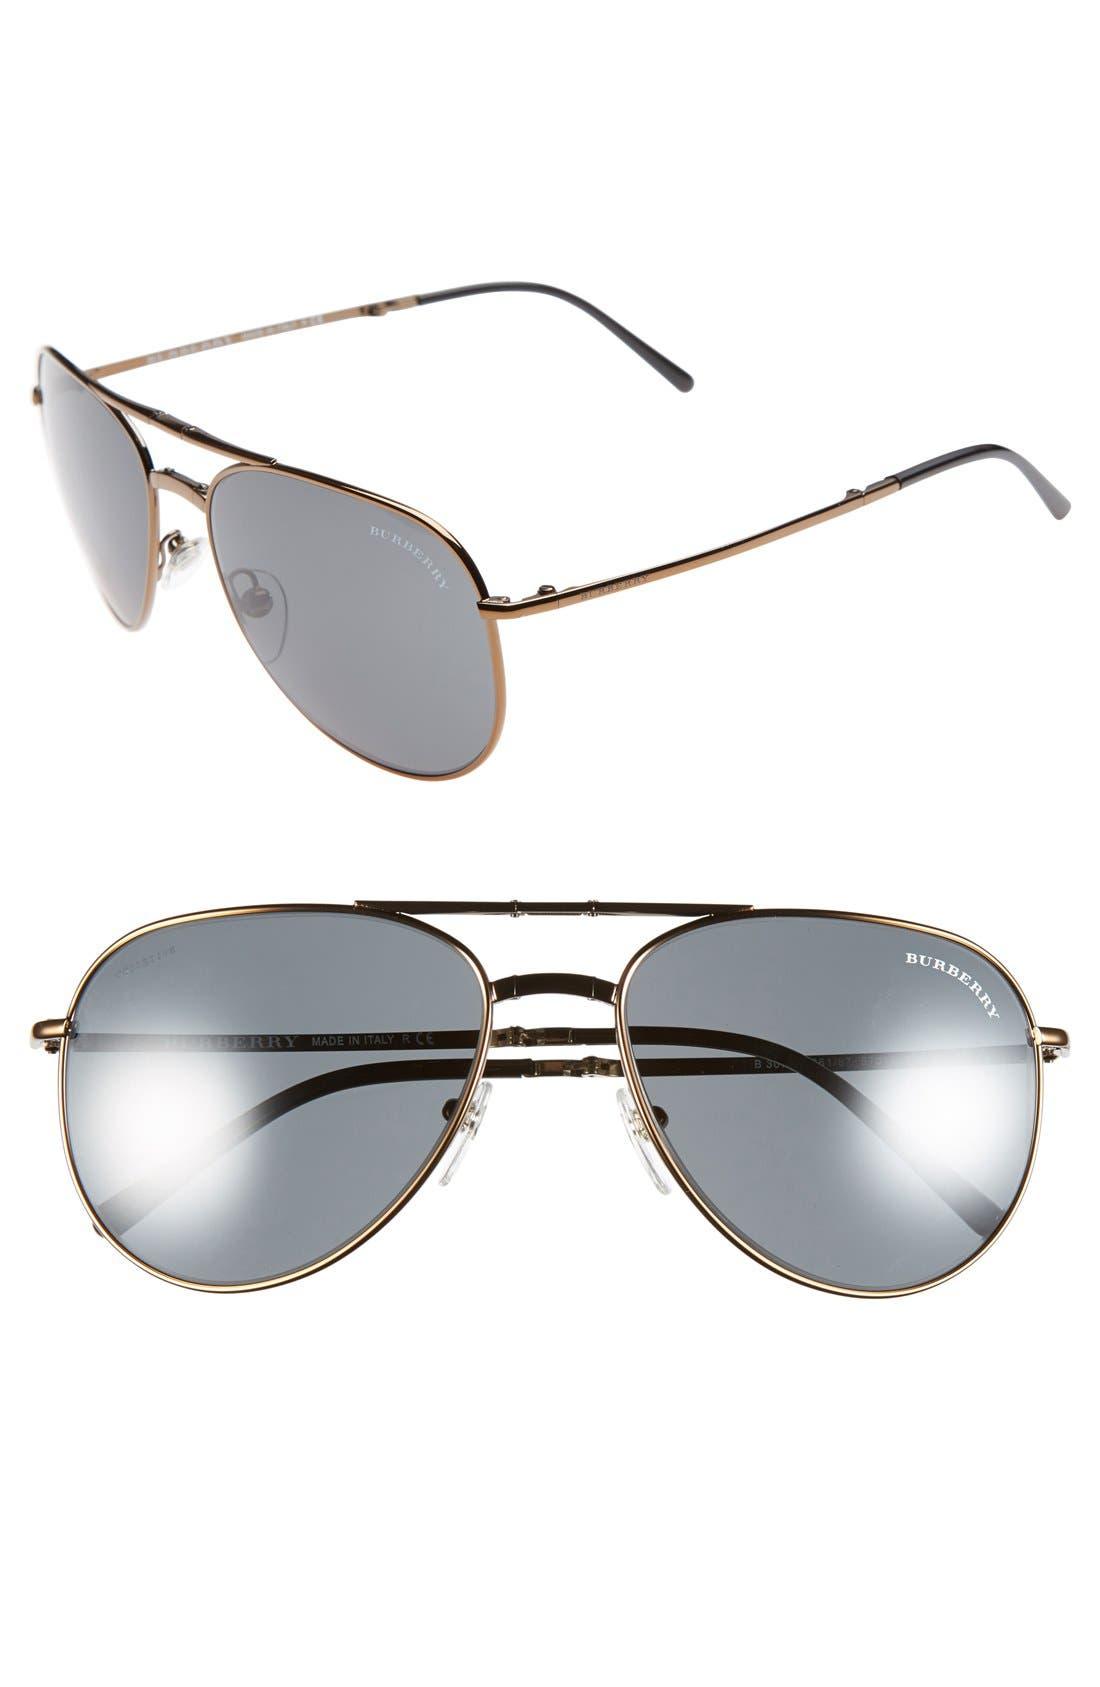 Alternate Image 1 Selected - Burberry 'Splash' 57mm Foldable Aviator Sunglasses